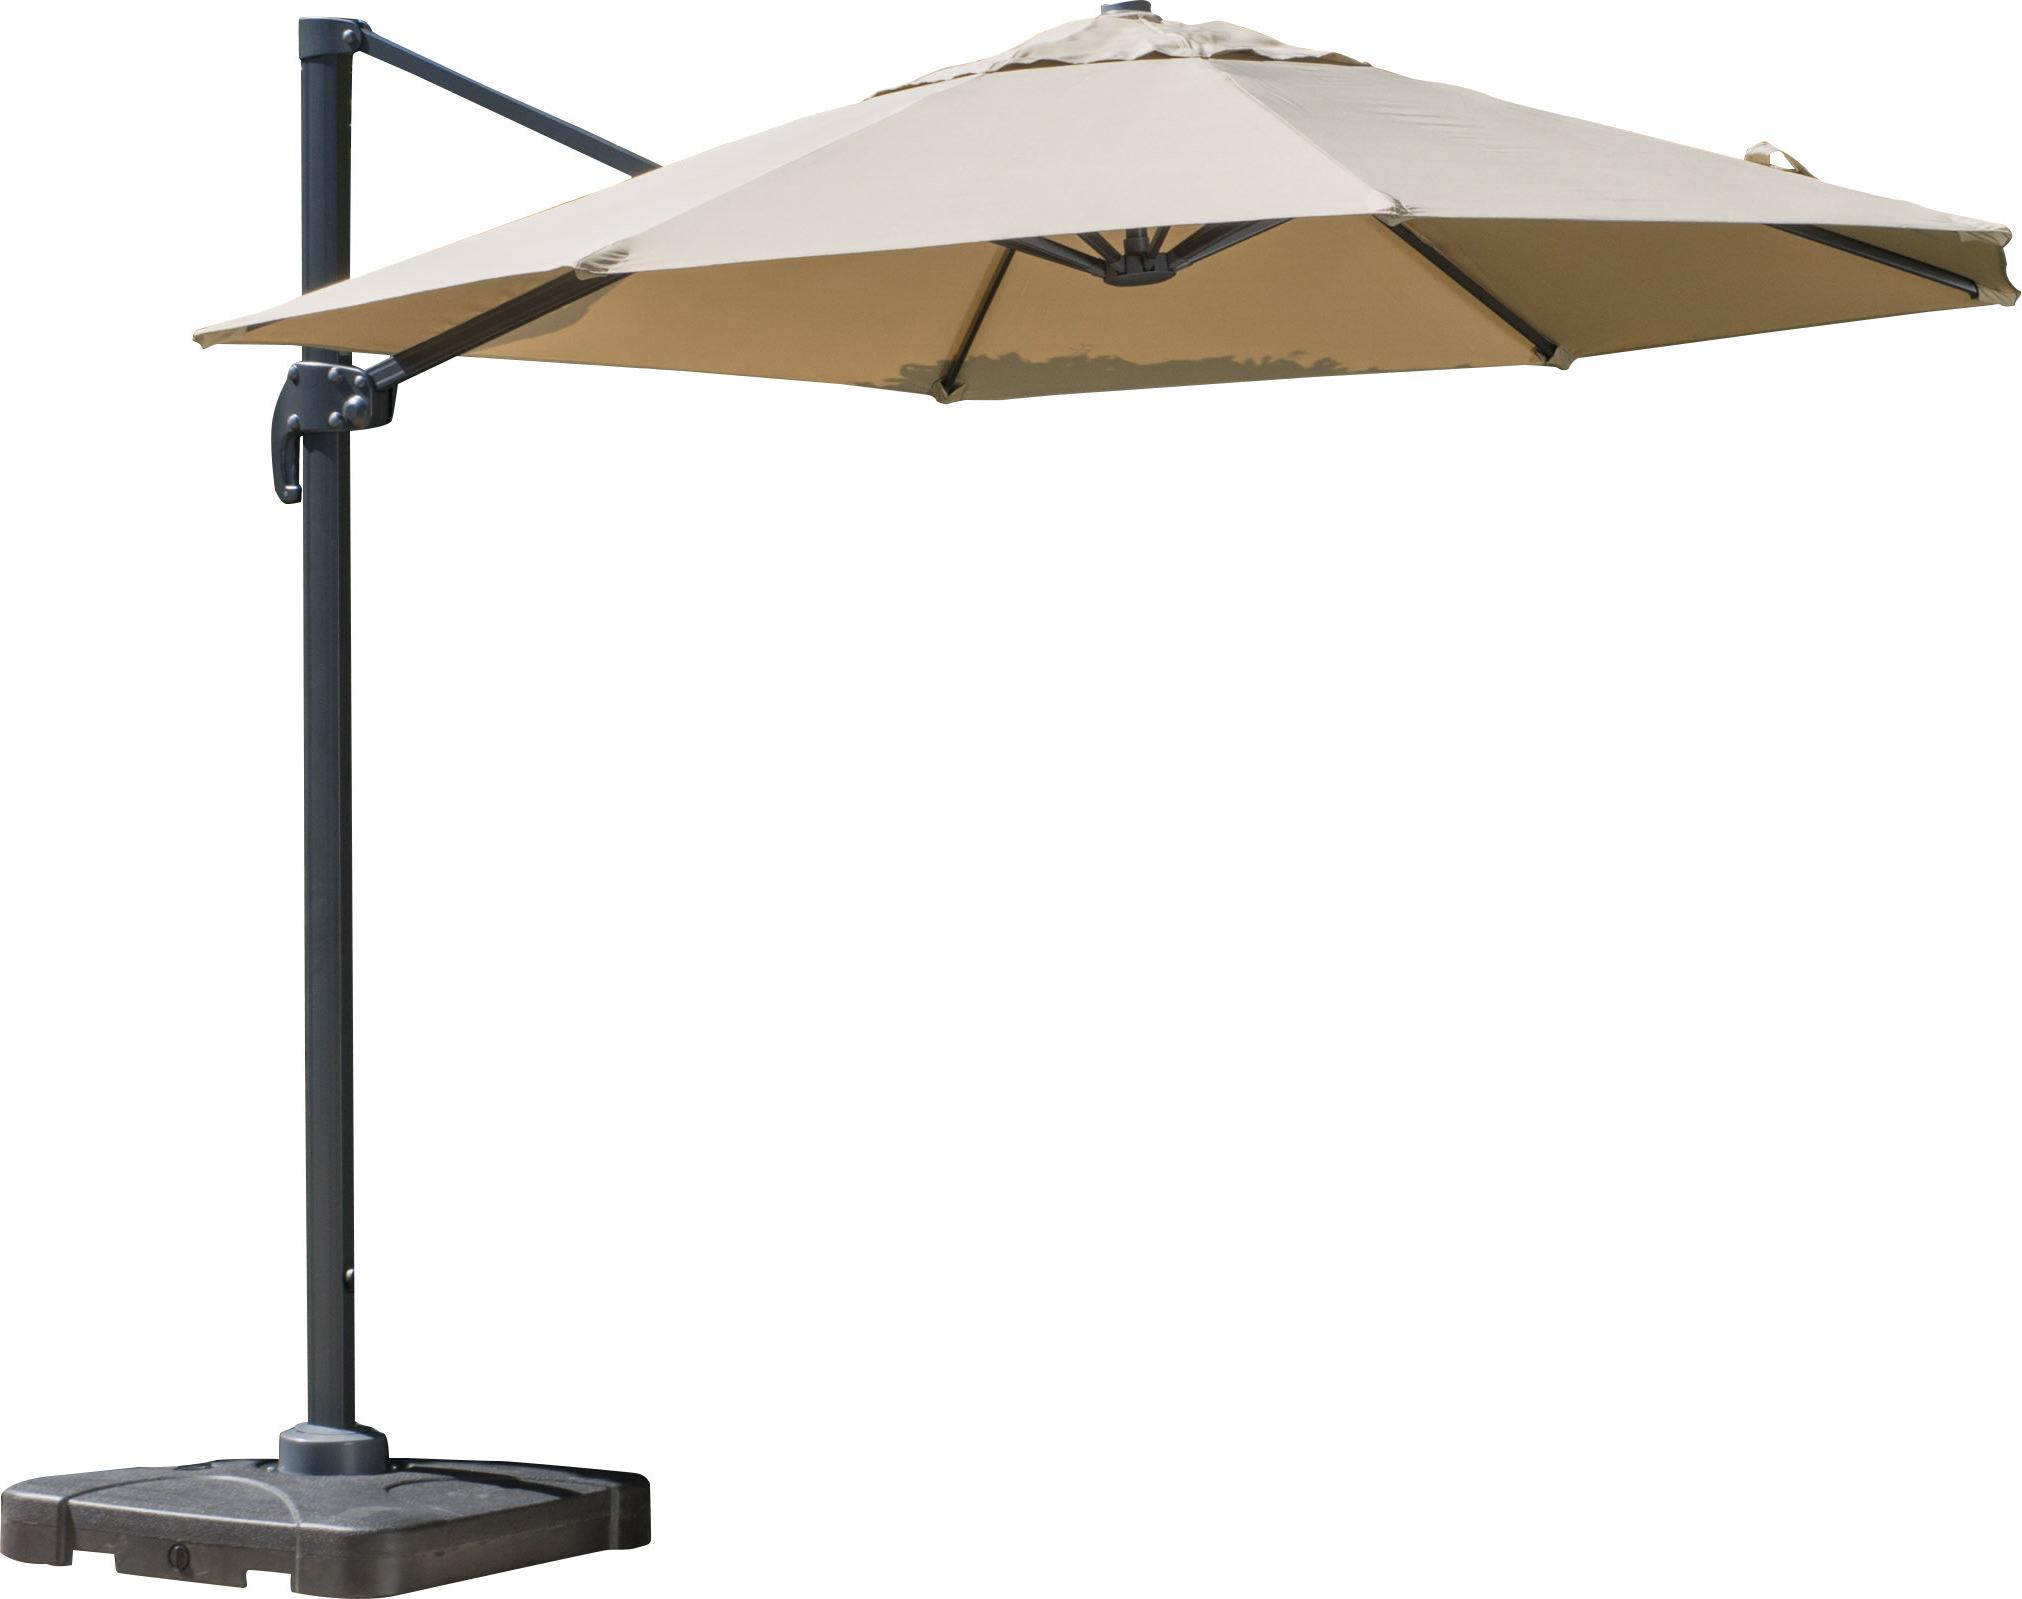 Jendayi Square Cantilever Umbrellas Inside Trendy Bellana Cantilever Umbrella (View 3 of 20)